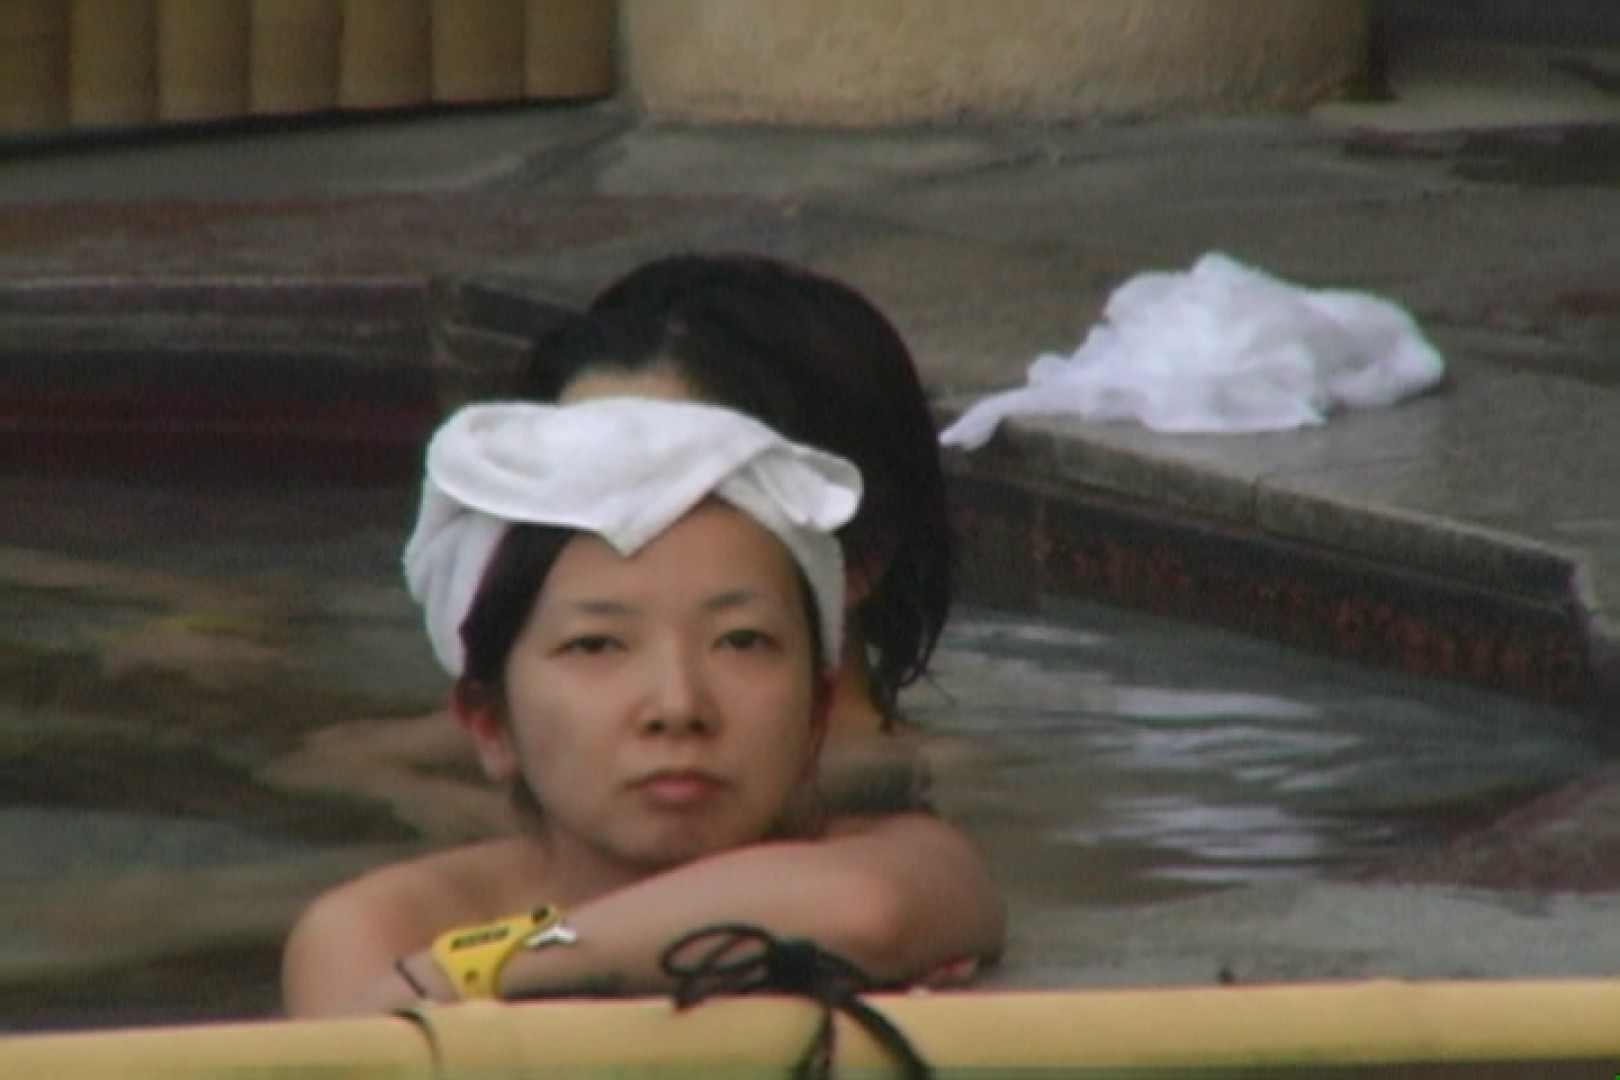 Aquaな露天風呂Vol.613 盗撮師作品 | 露天風呂突入  103pic 1